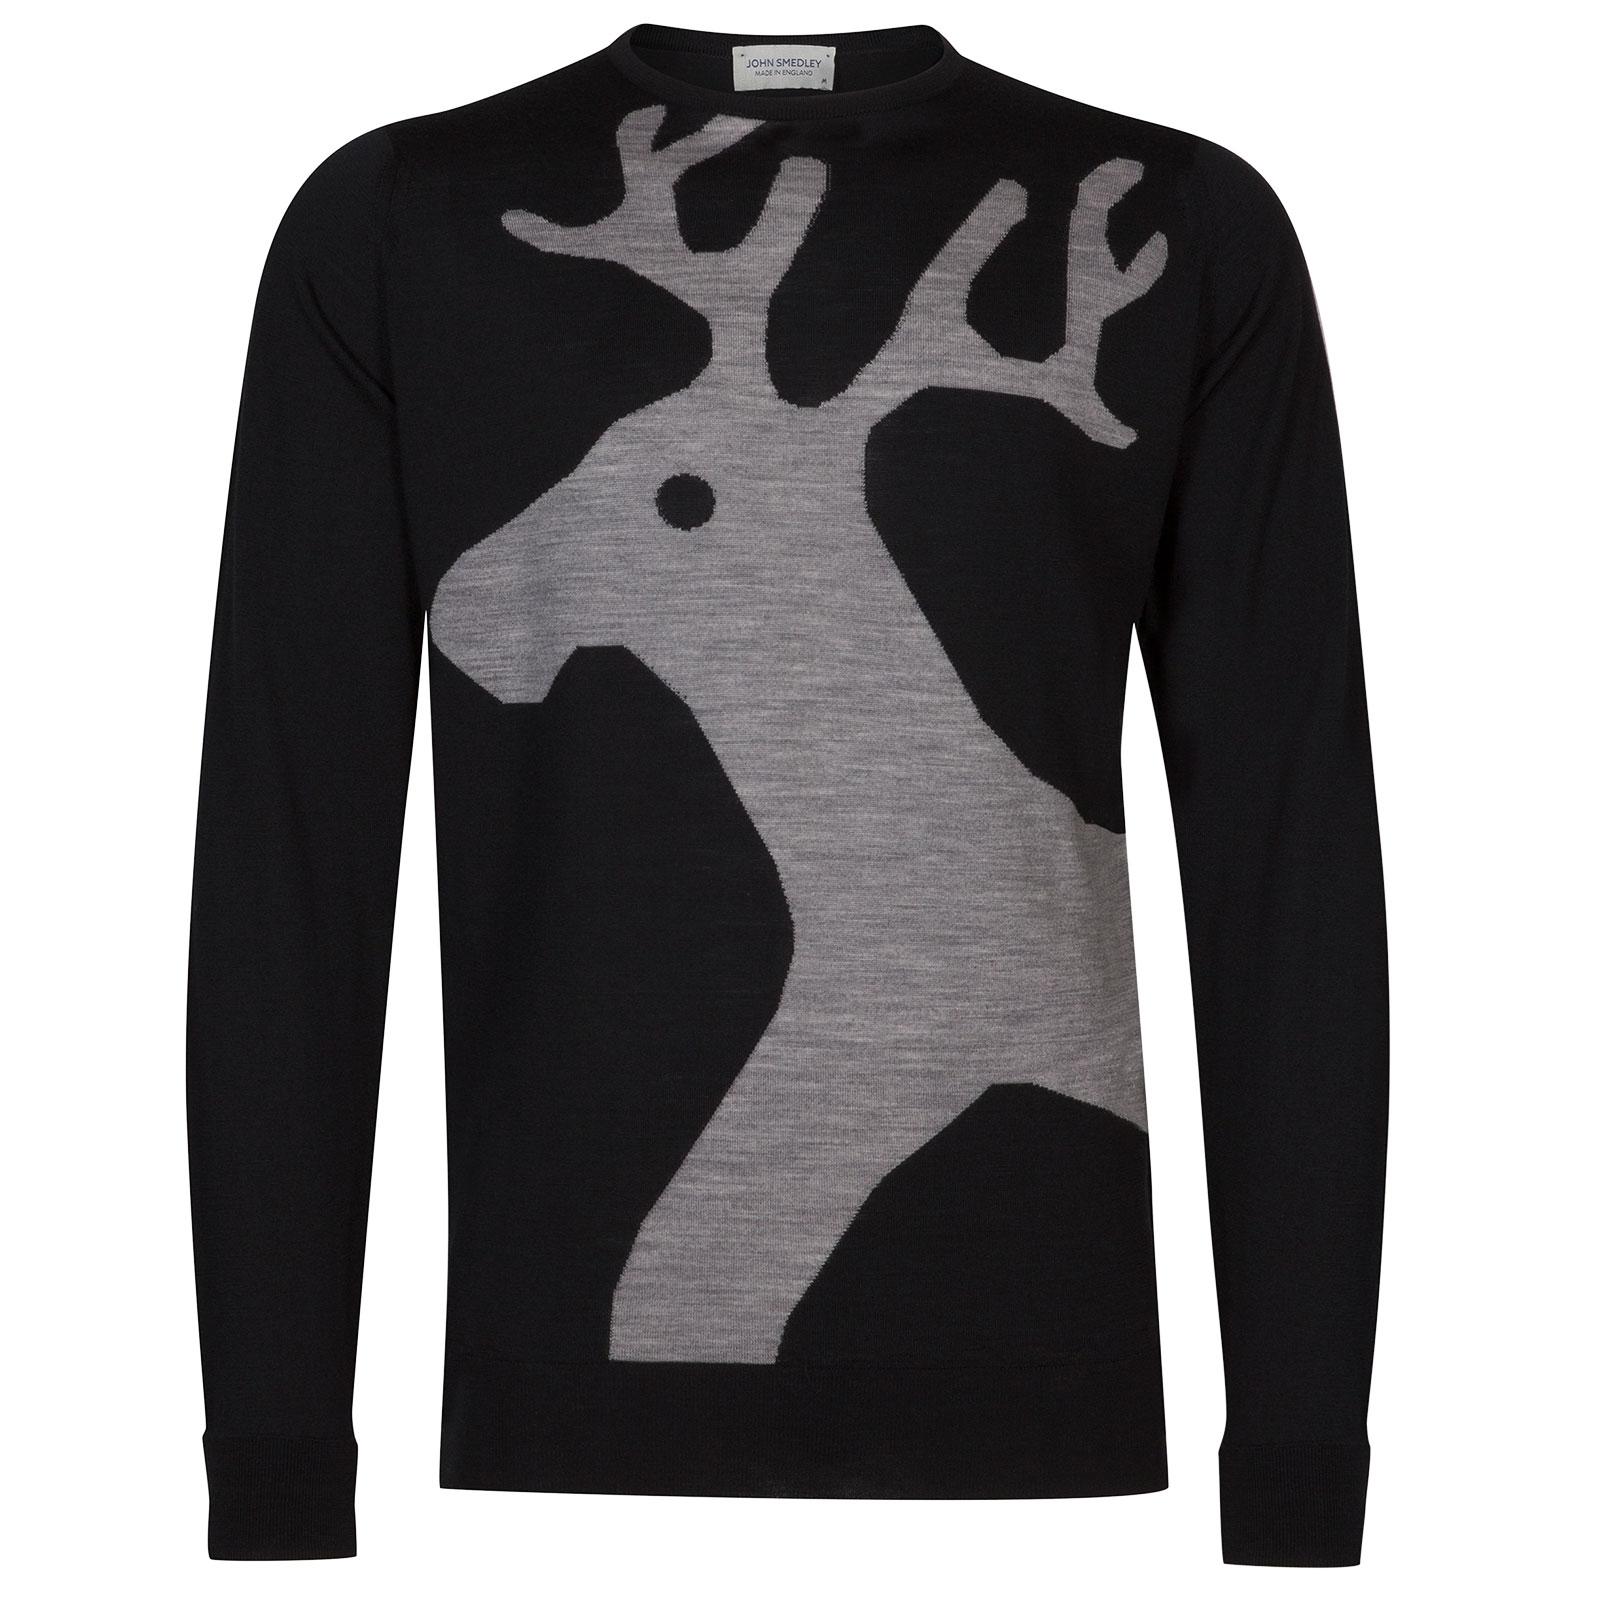 John Smedley Raoul Extra Fine Merino Pullover in Black-XL